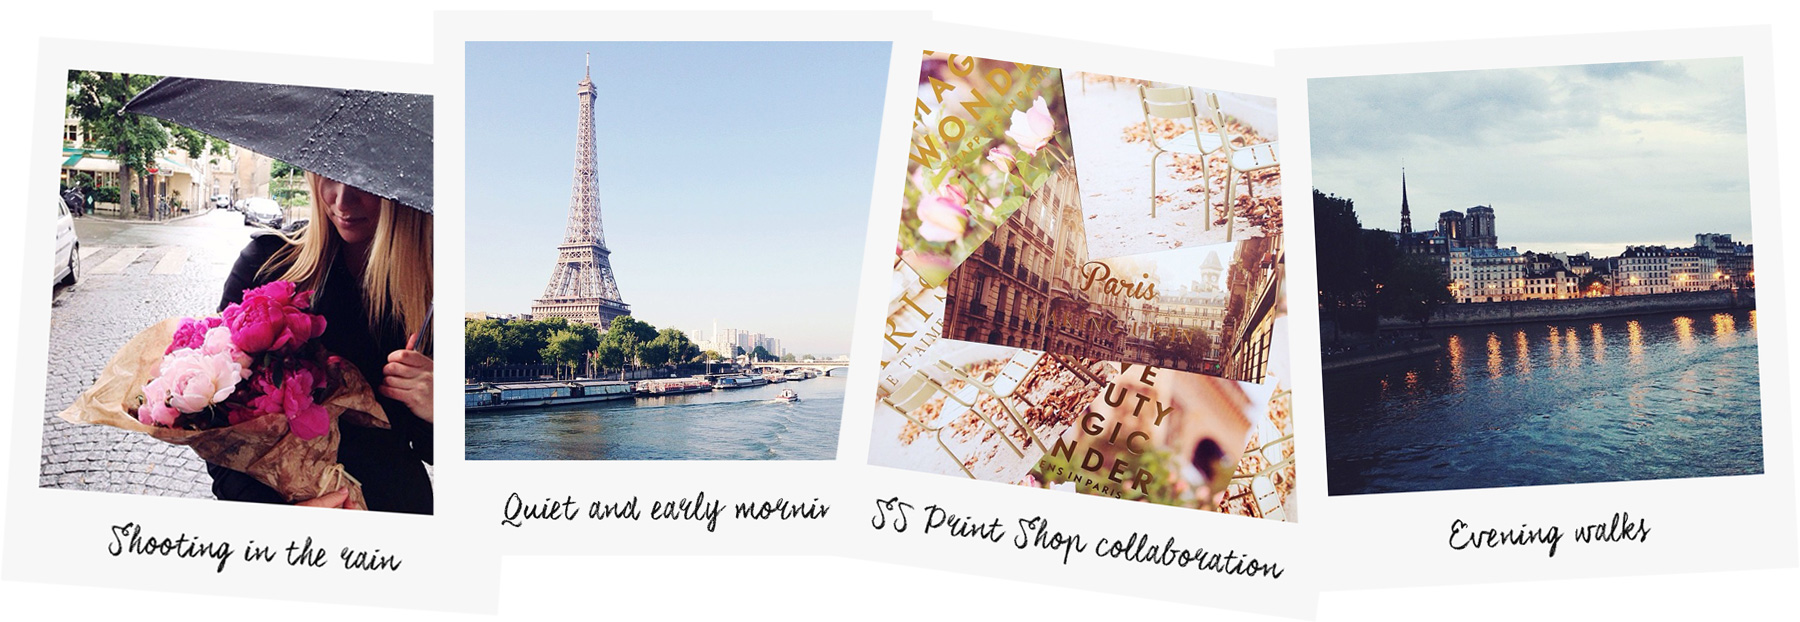 Paris polaroids photo by Carin Olsson (Paris in Four Months)